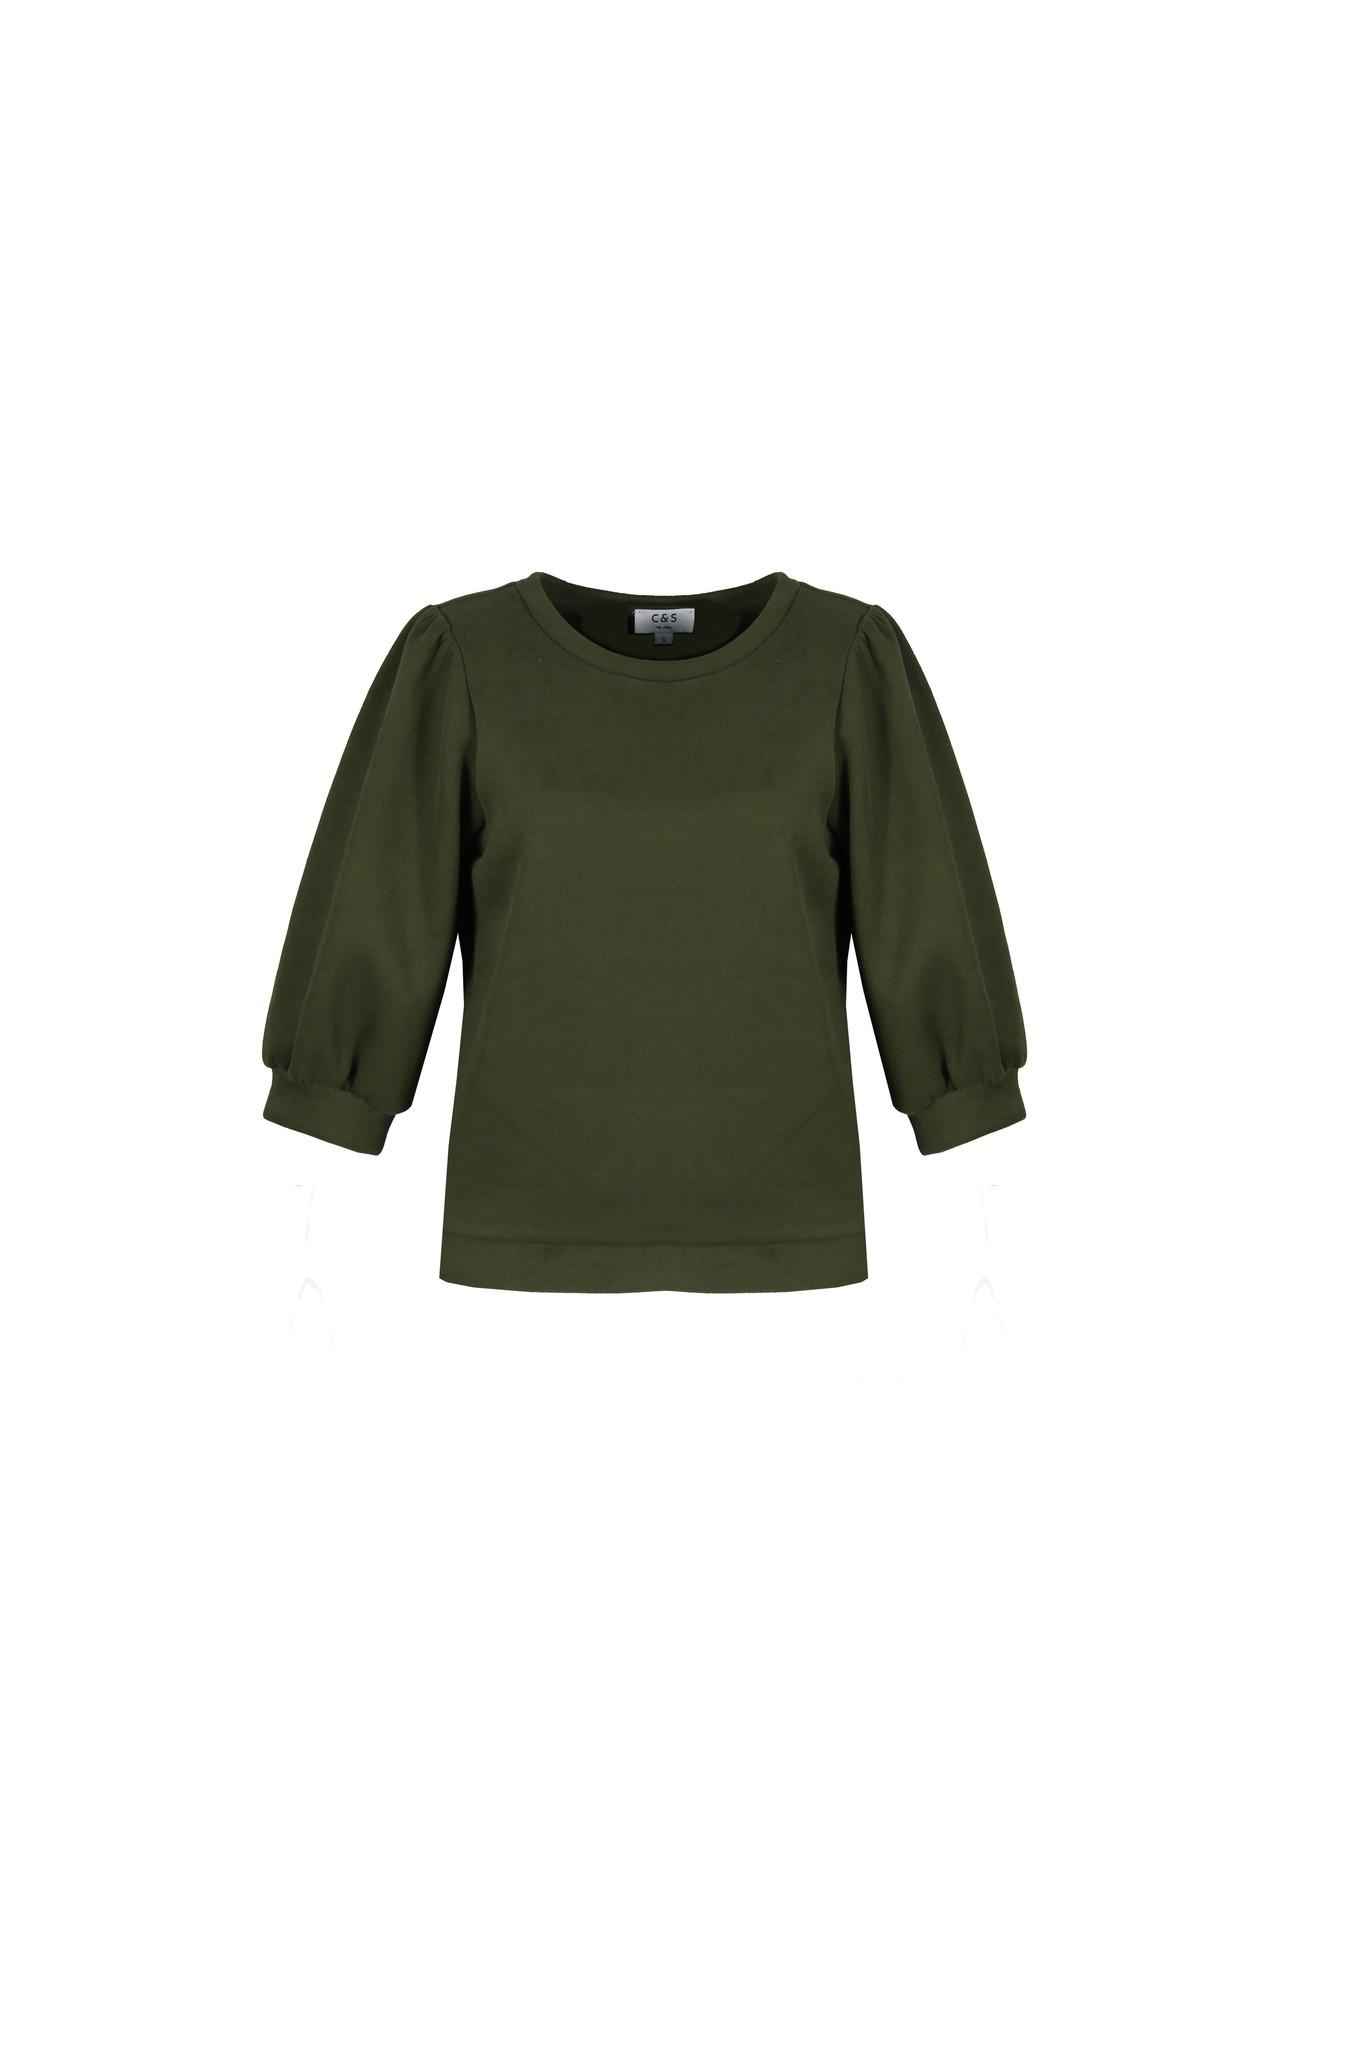 C&S The label C&S The Label June sweater groen